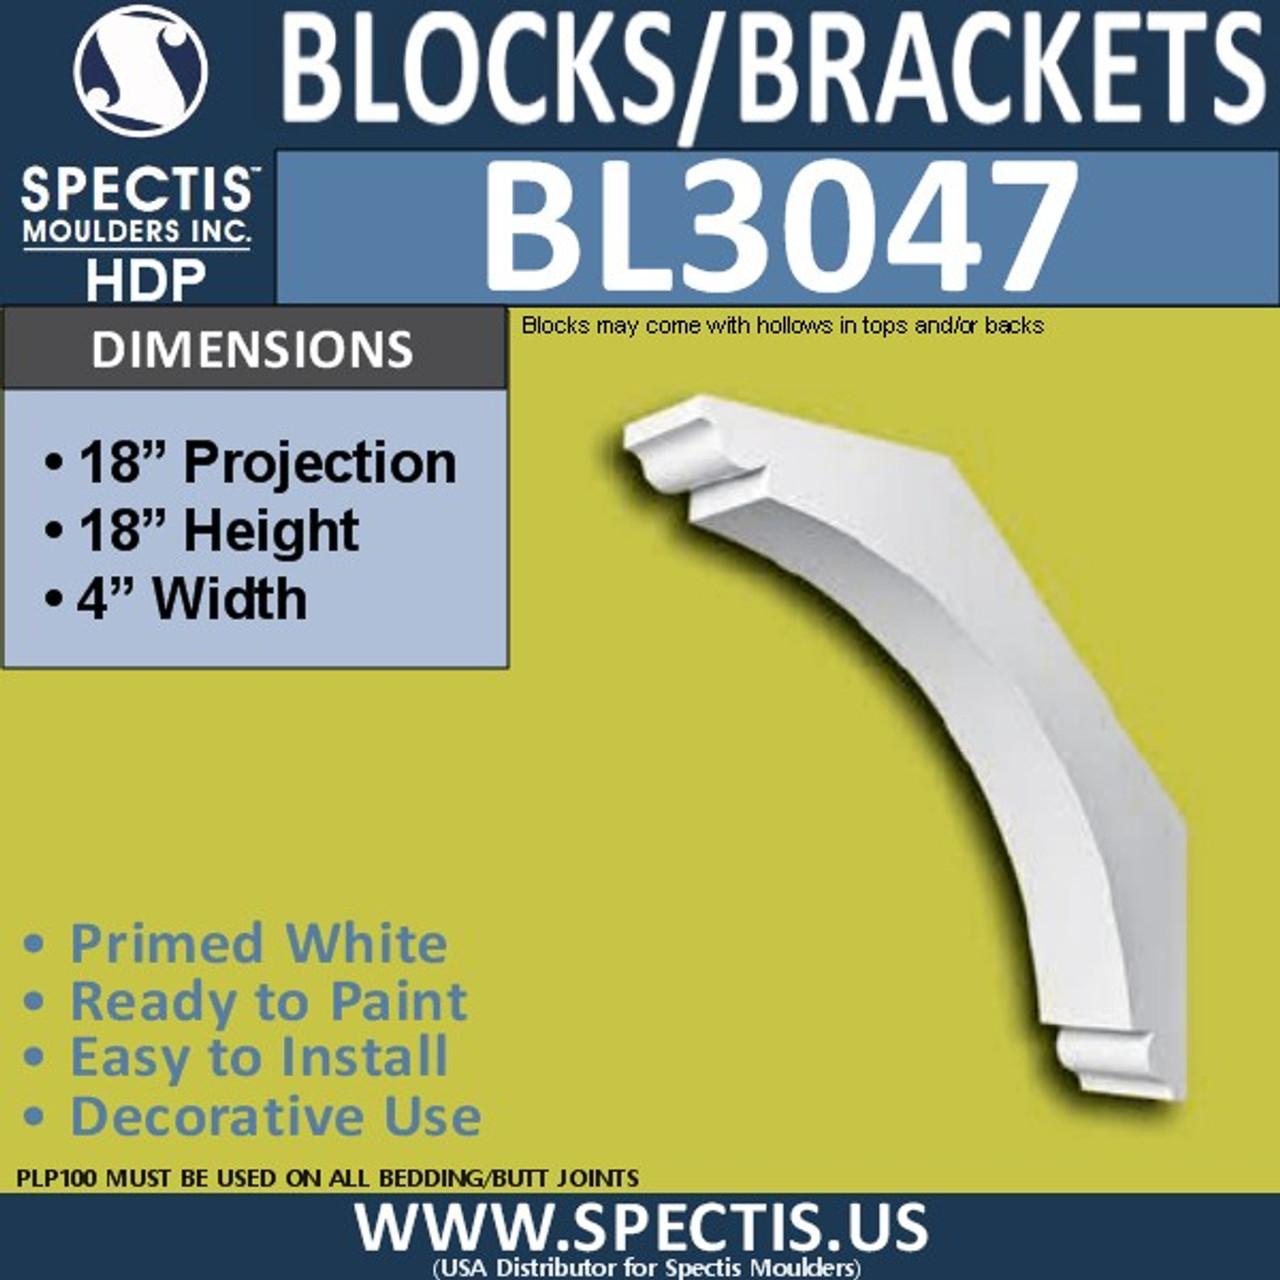 "BL3047 Eave Block or Bracket 4""W x 18""H x 18"" P"